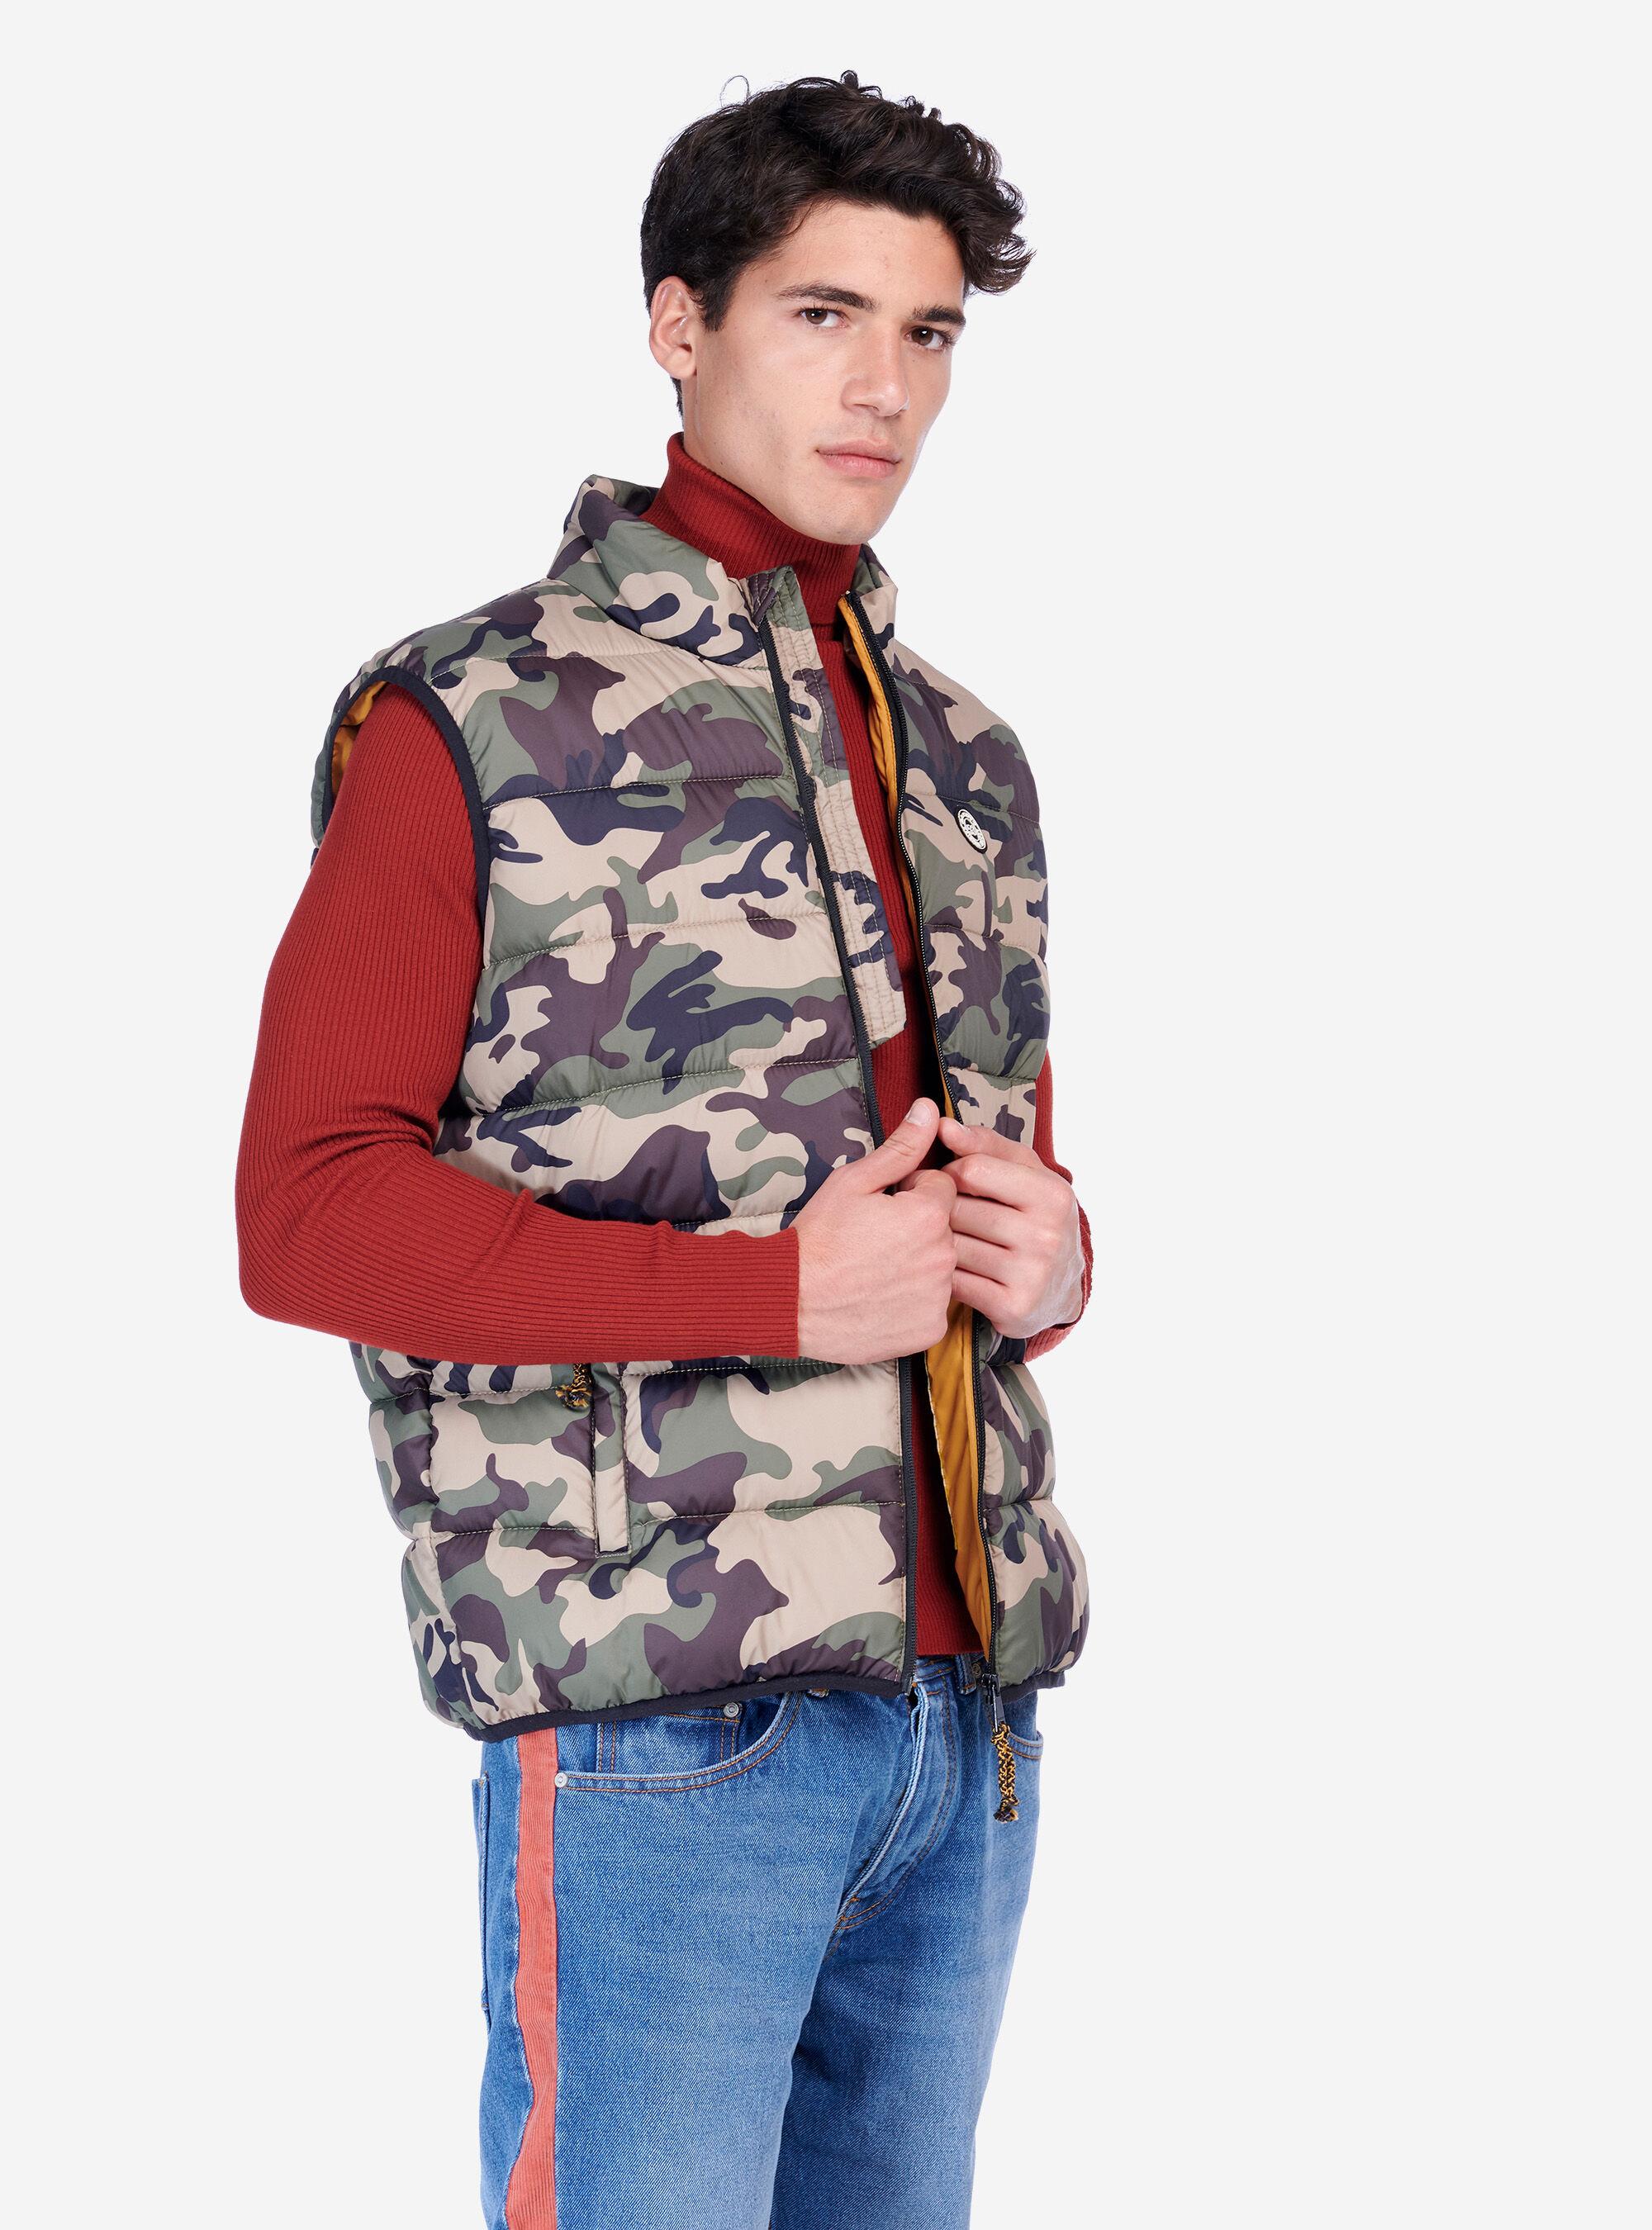 giacca di jeans uomo 20 euro